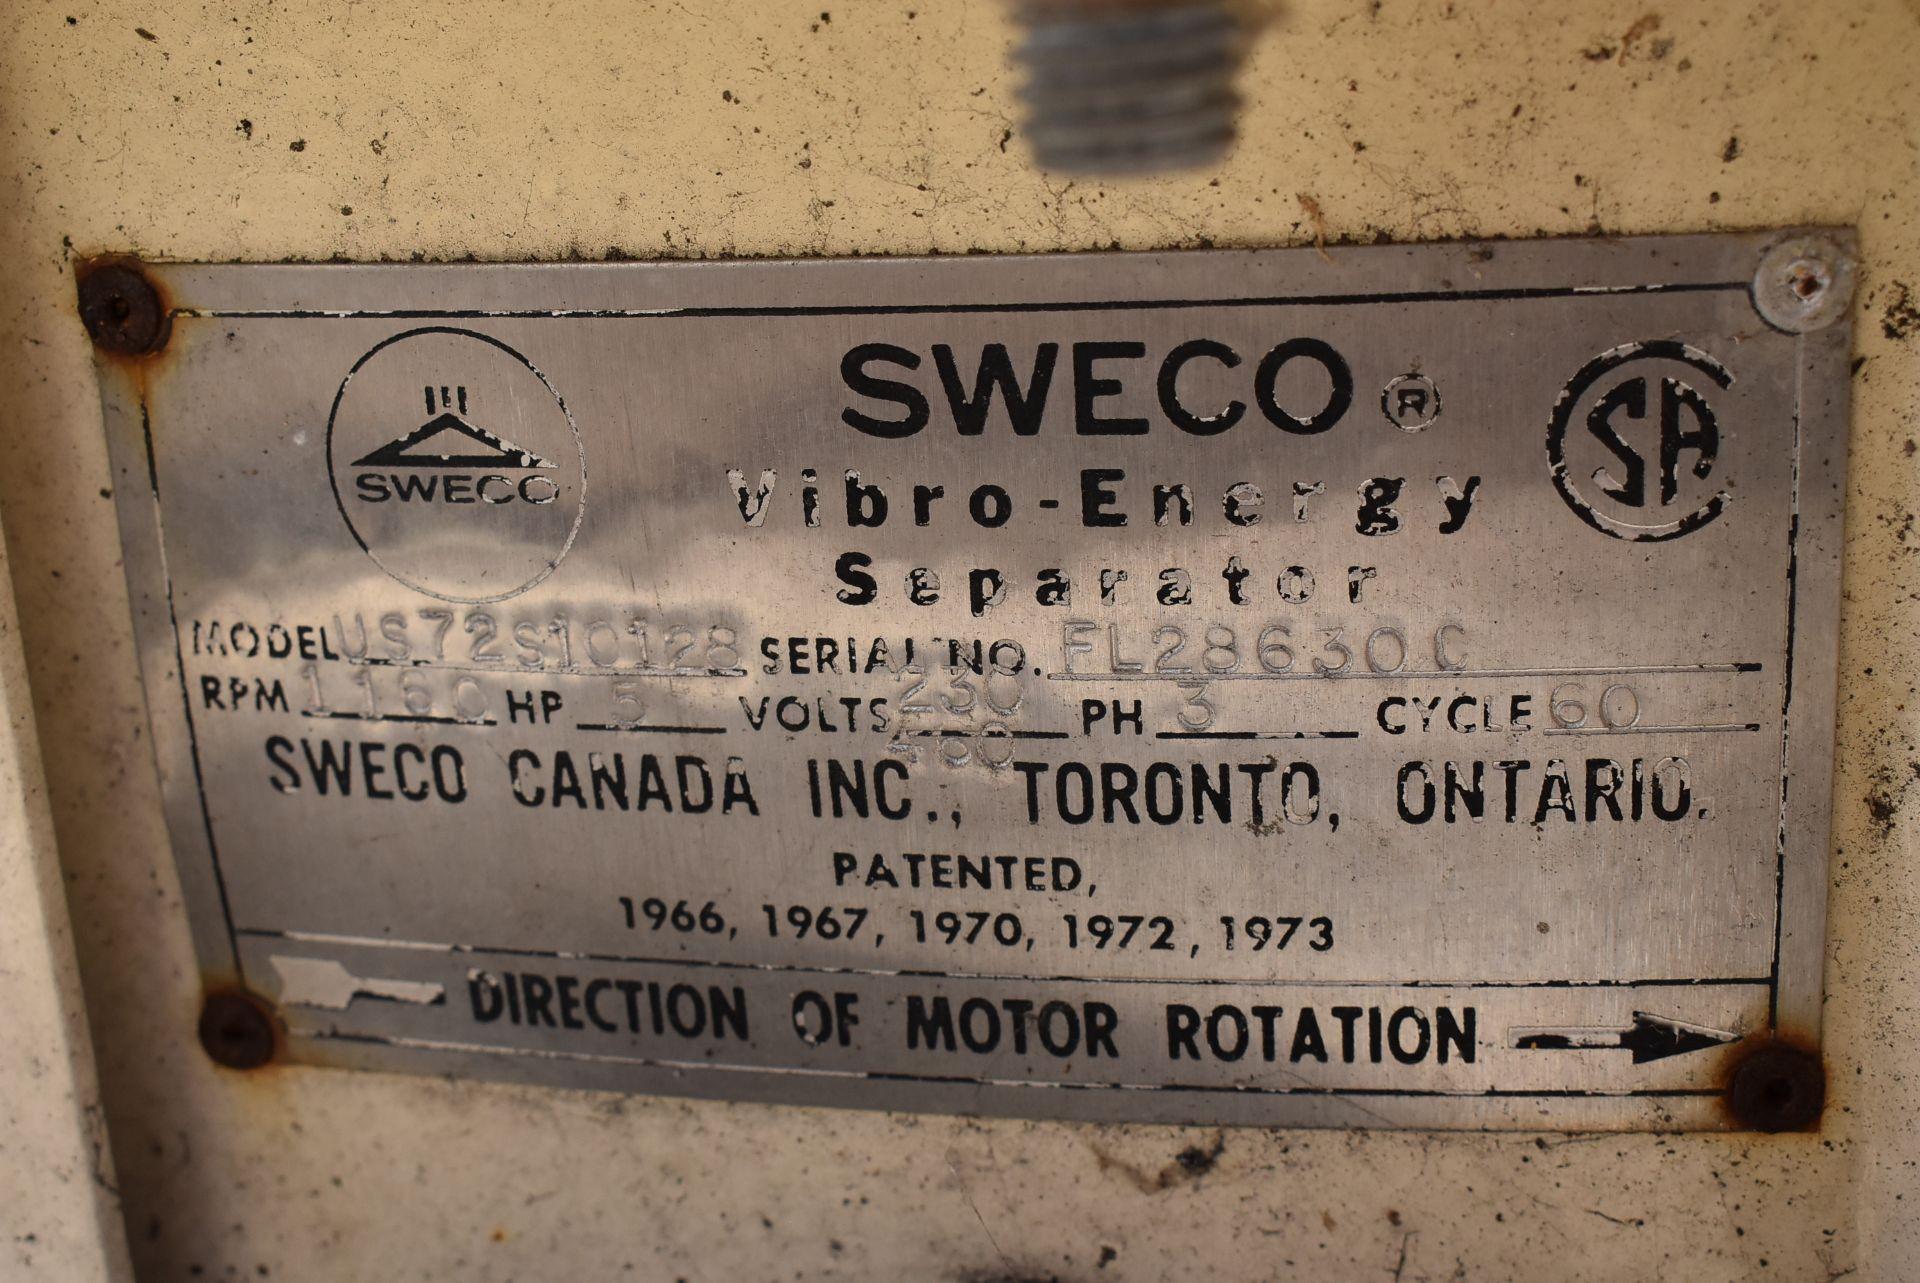 SWECO Model #US72510128 Vibratory Separator - Image 3 of 4